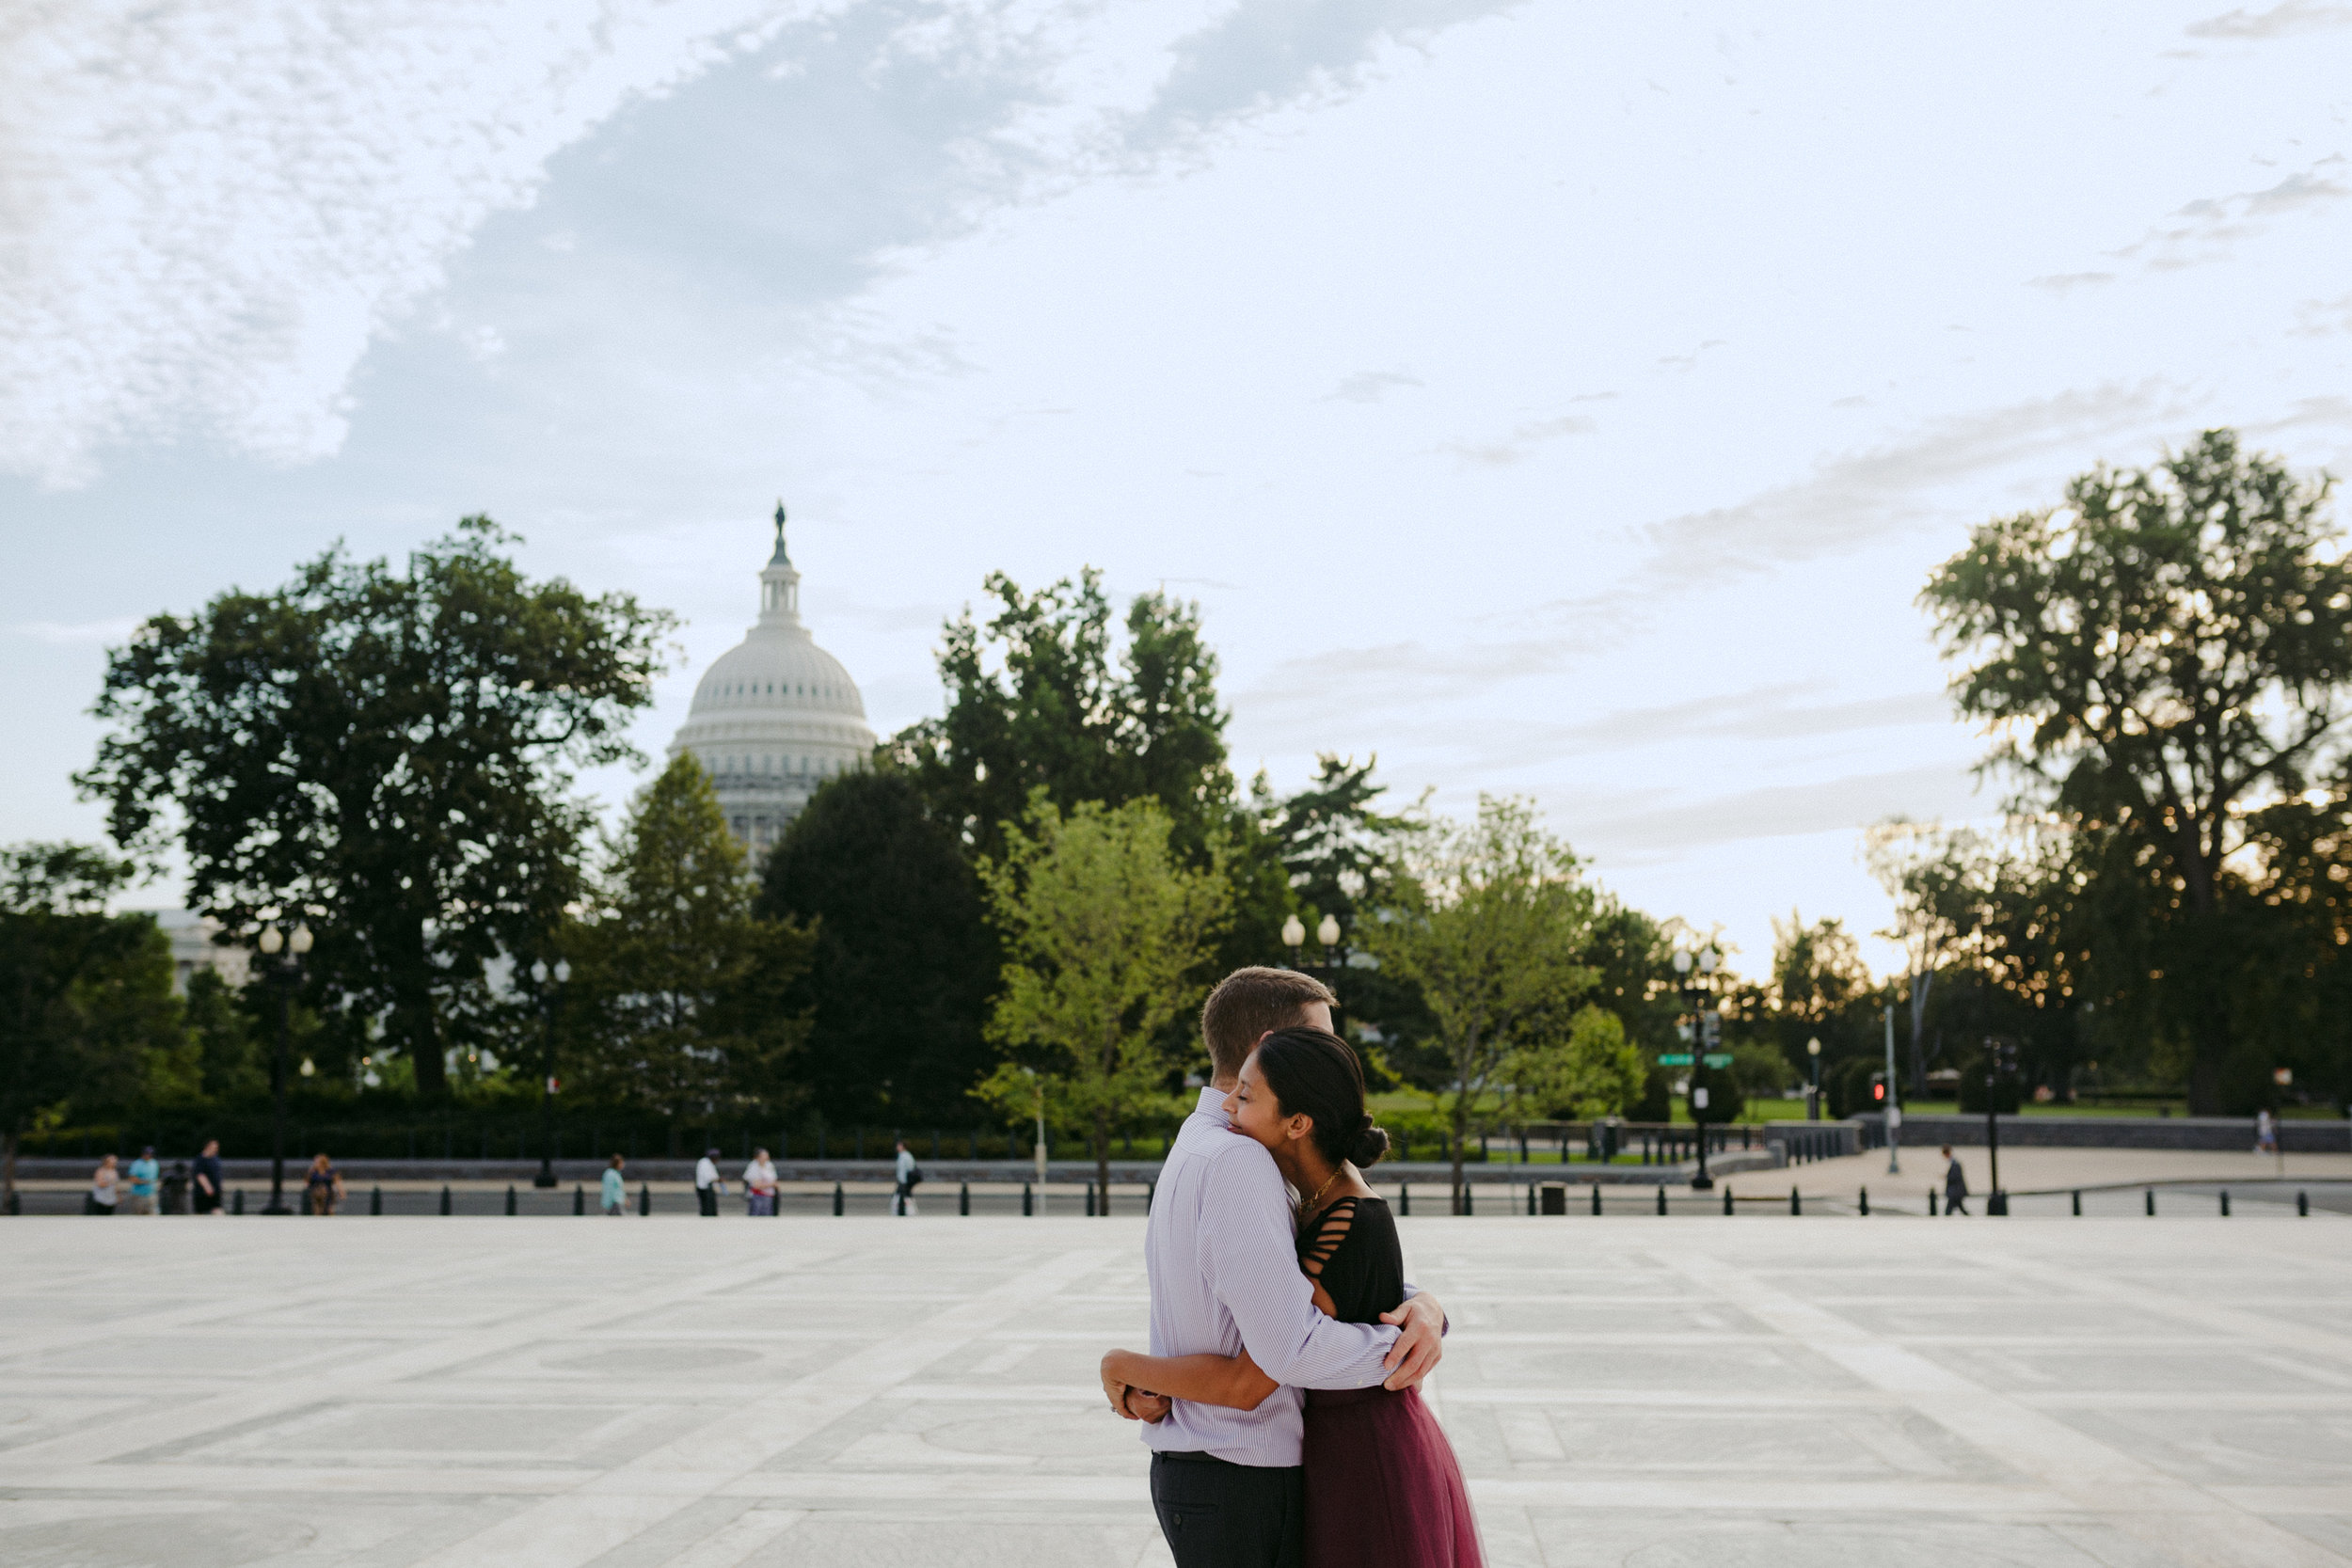 dc_wedding_photographer-11.jpg